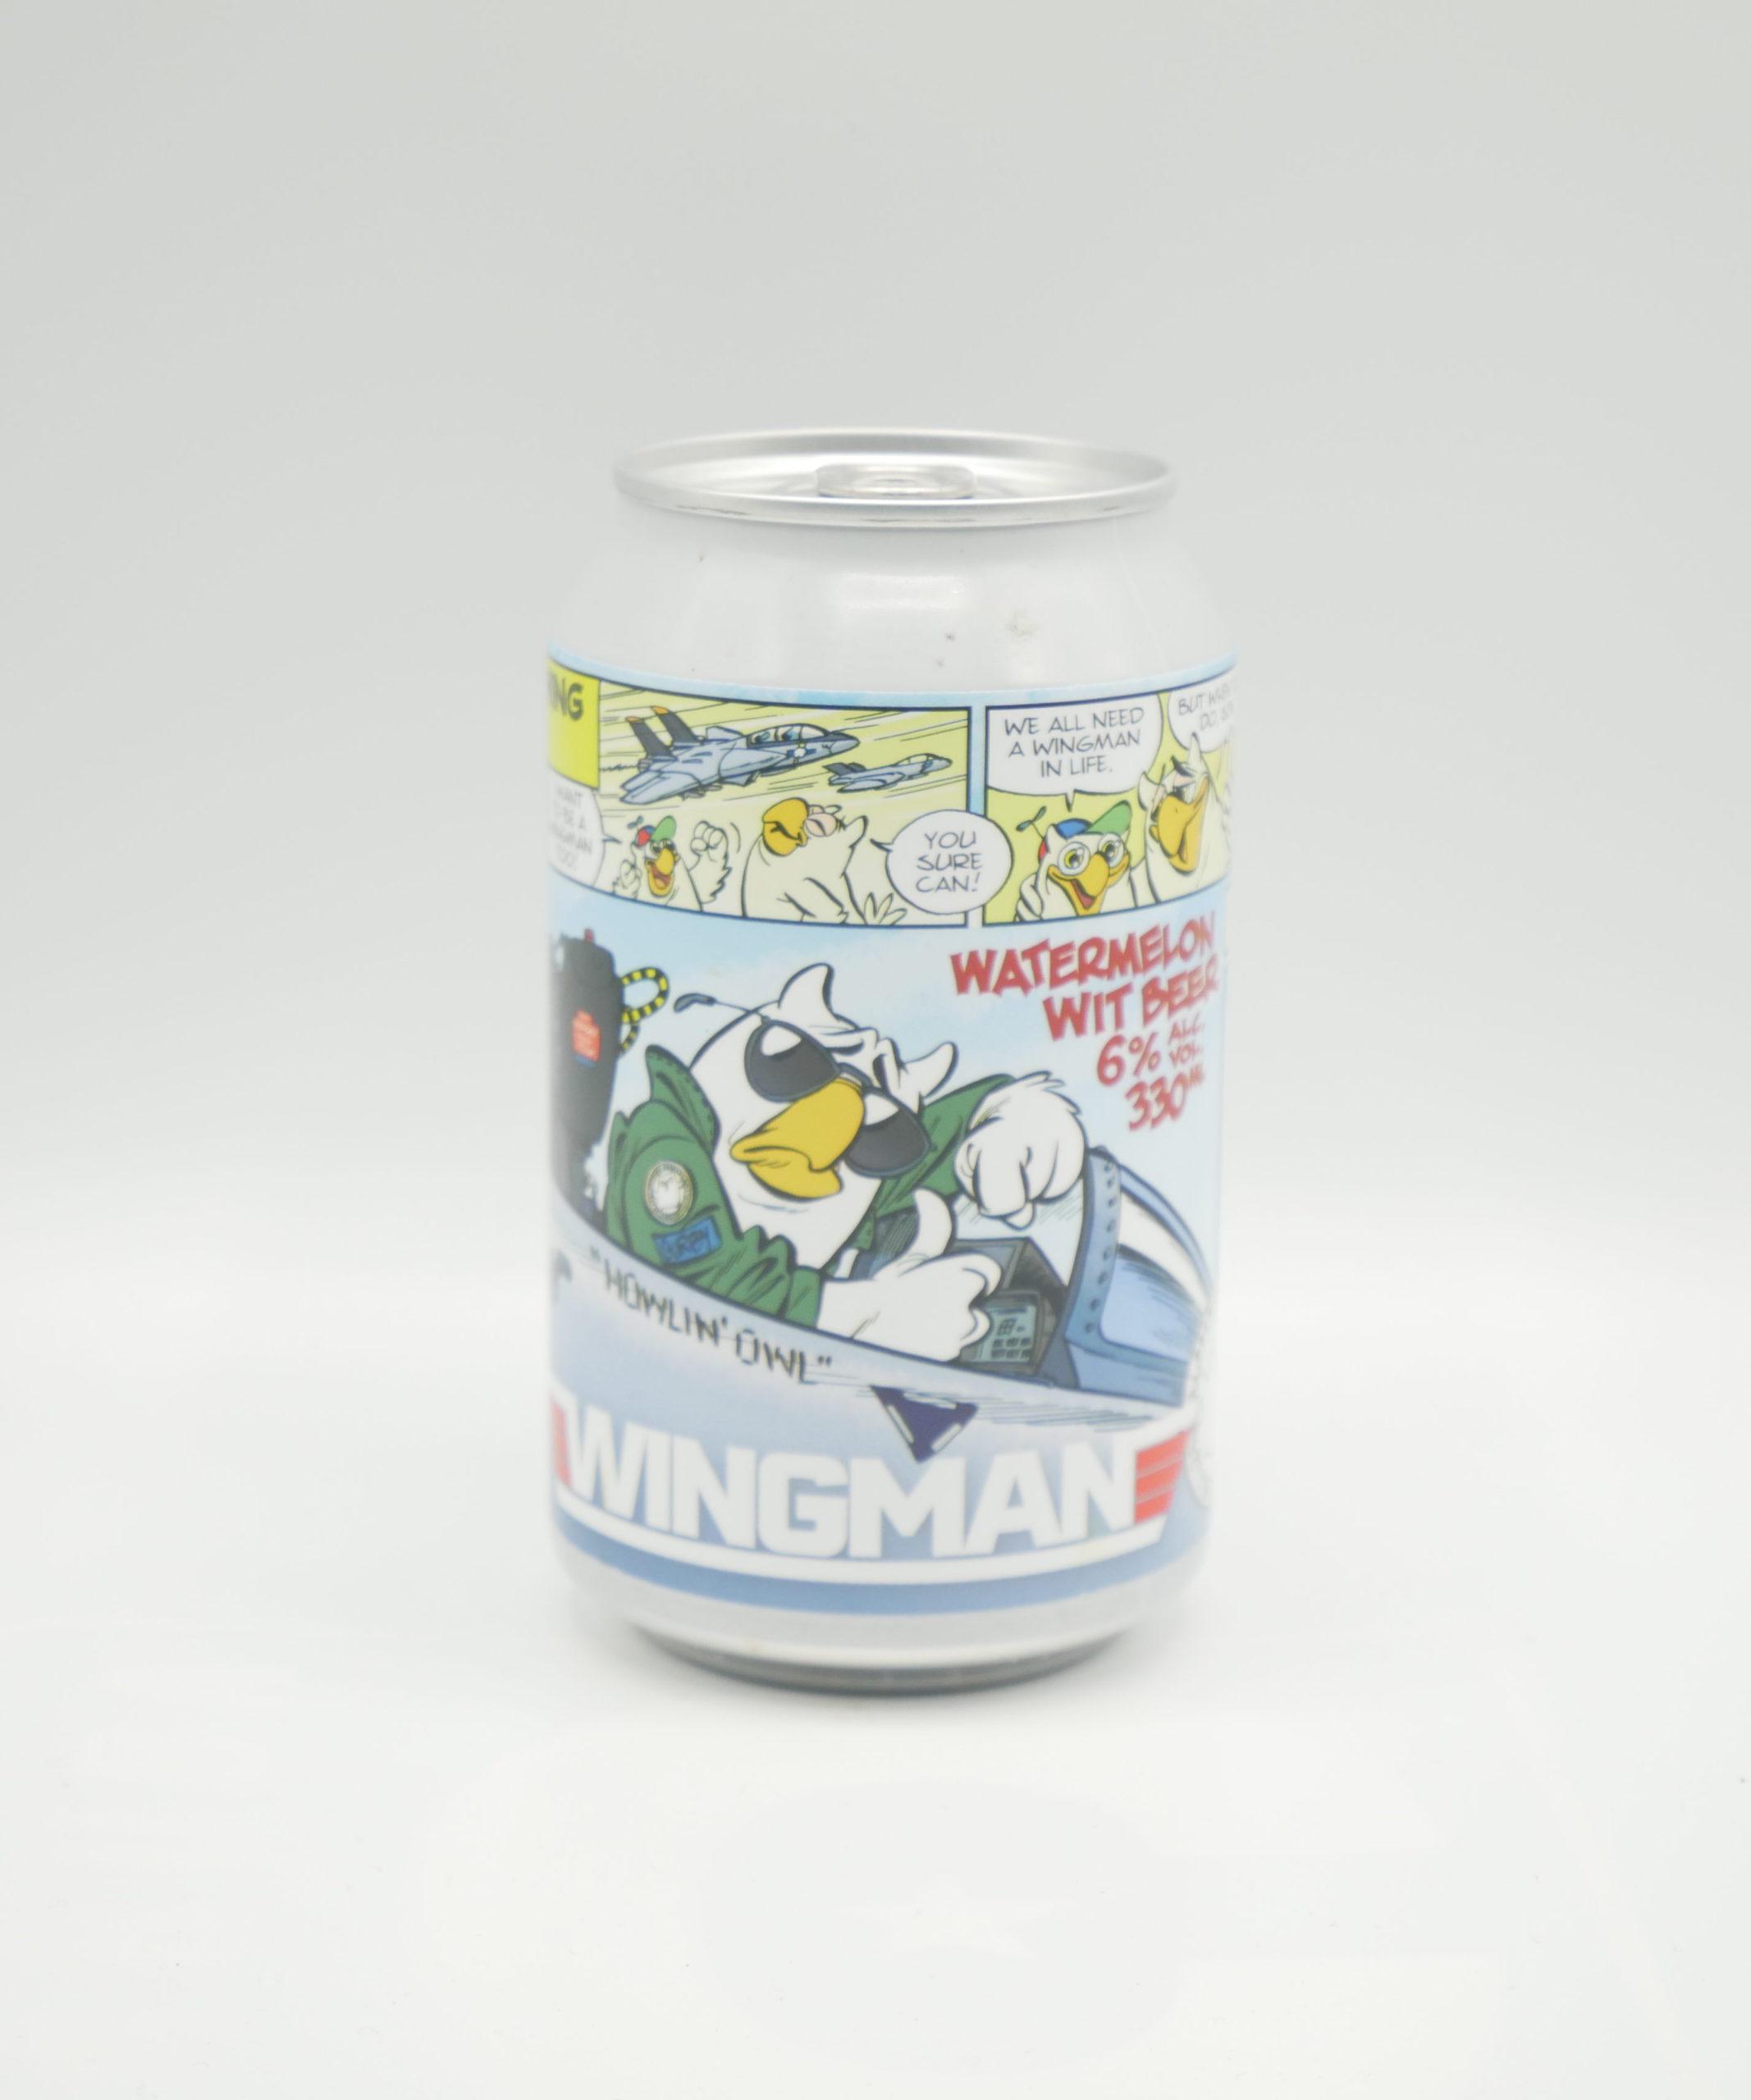 Image Wingman